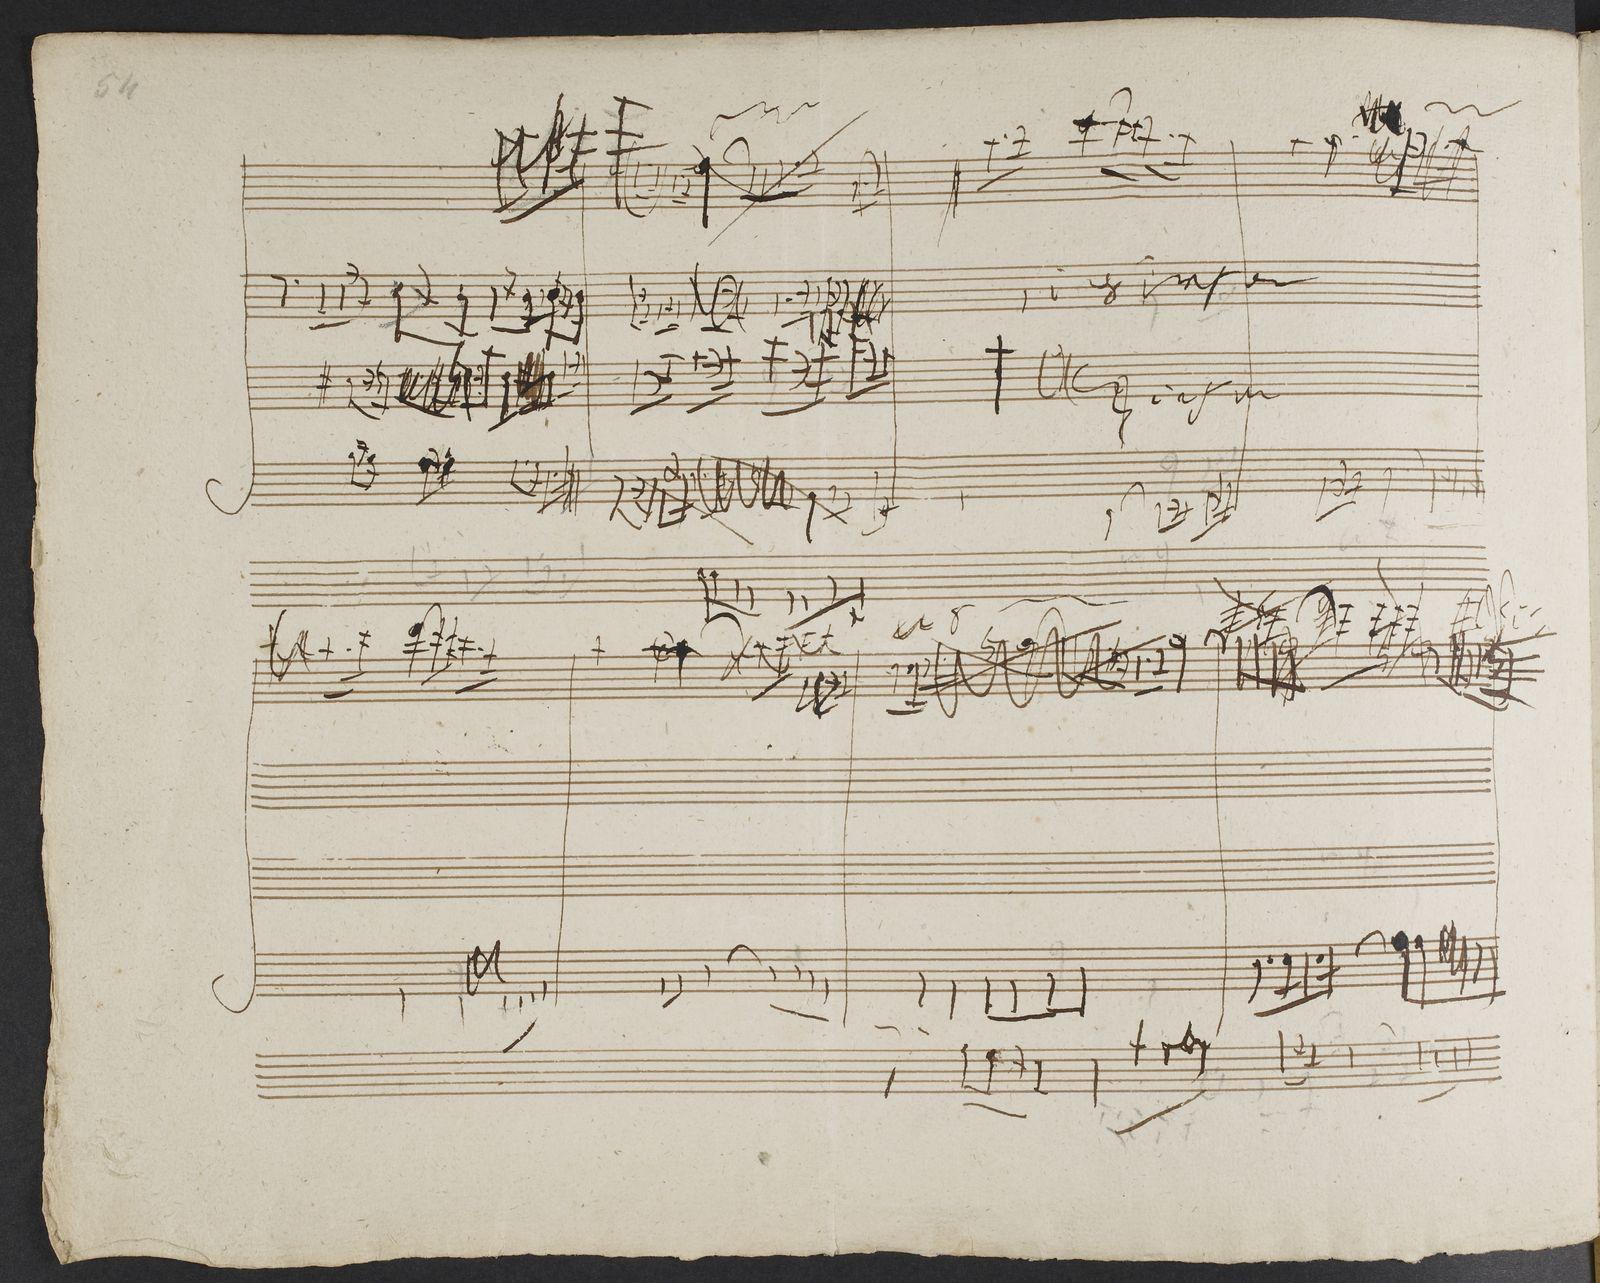 Bach handwriting analysis